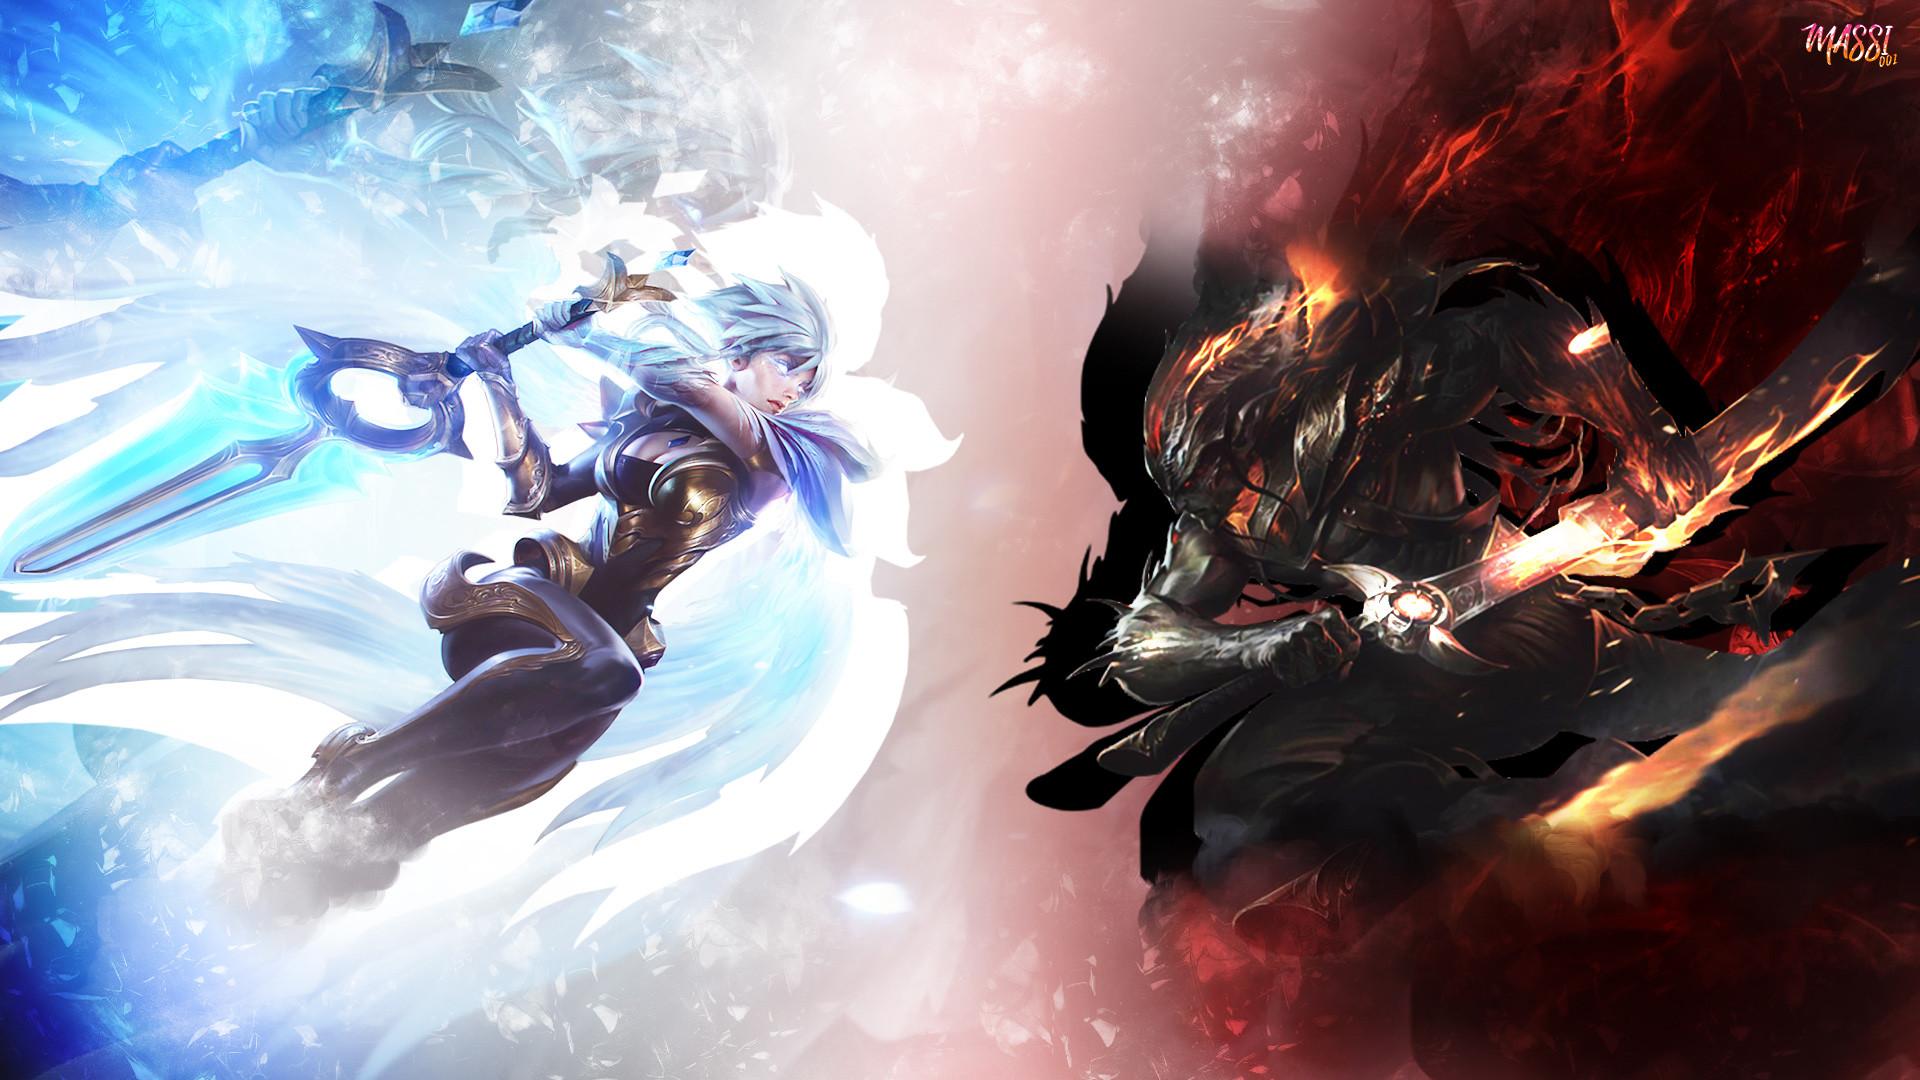 Dawnbringer Riven & Nightbringer Yasuo by Massi001 HD Wallpaper Background  Official Artwork League of Legends lol